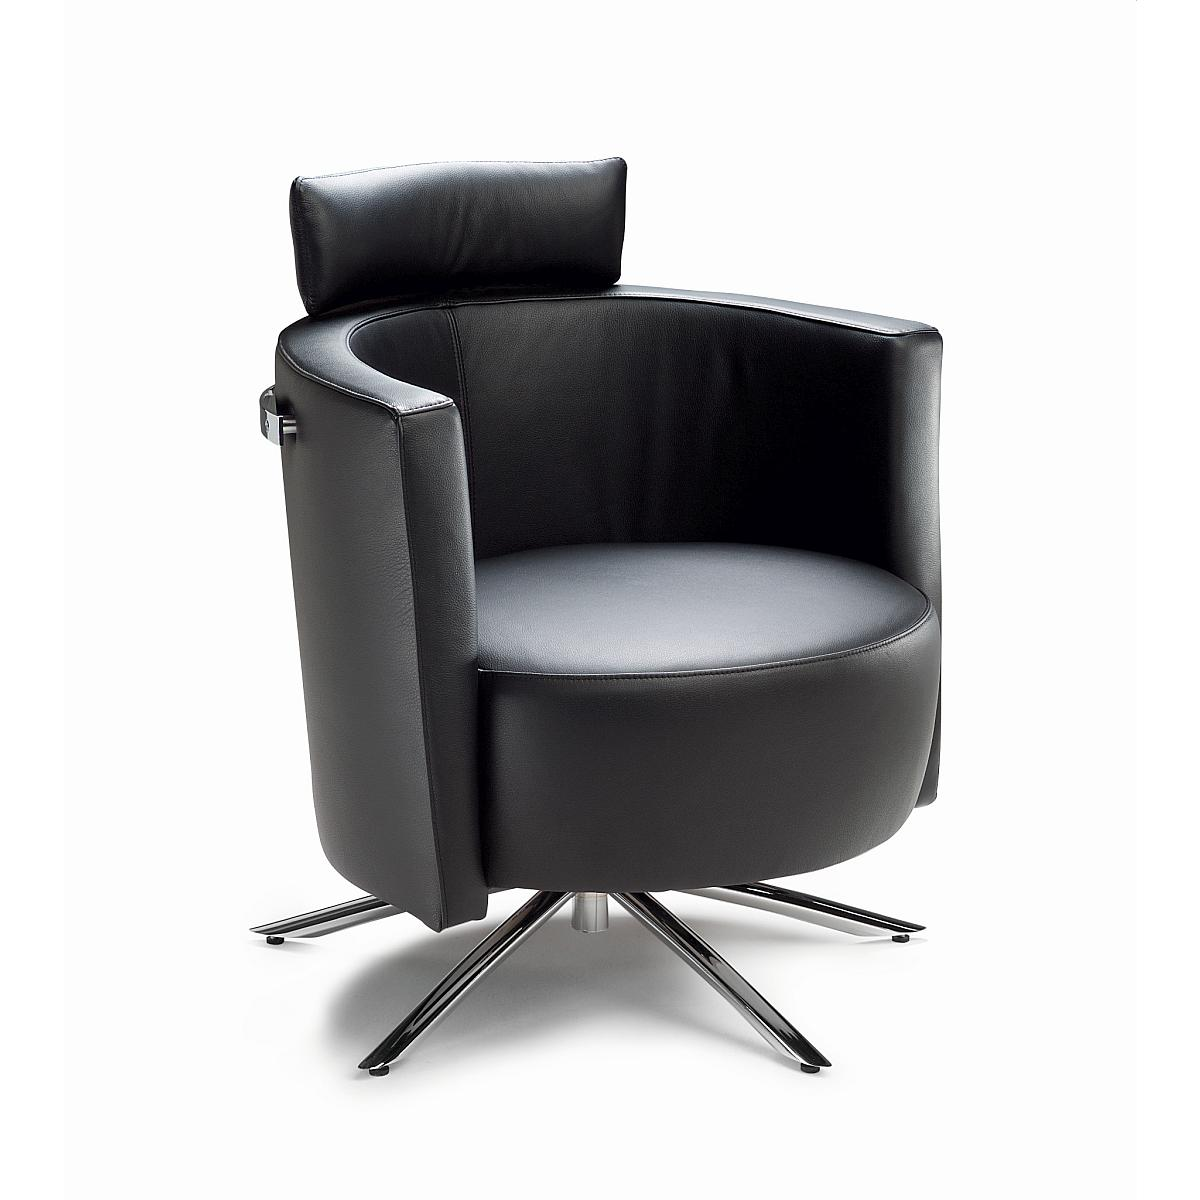 VITO Sessel in Leder COLORADO mit Kopfstütze und Reeling